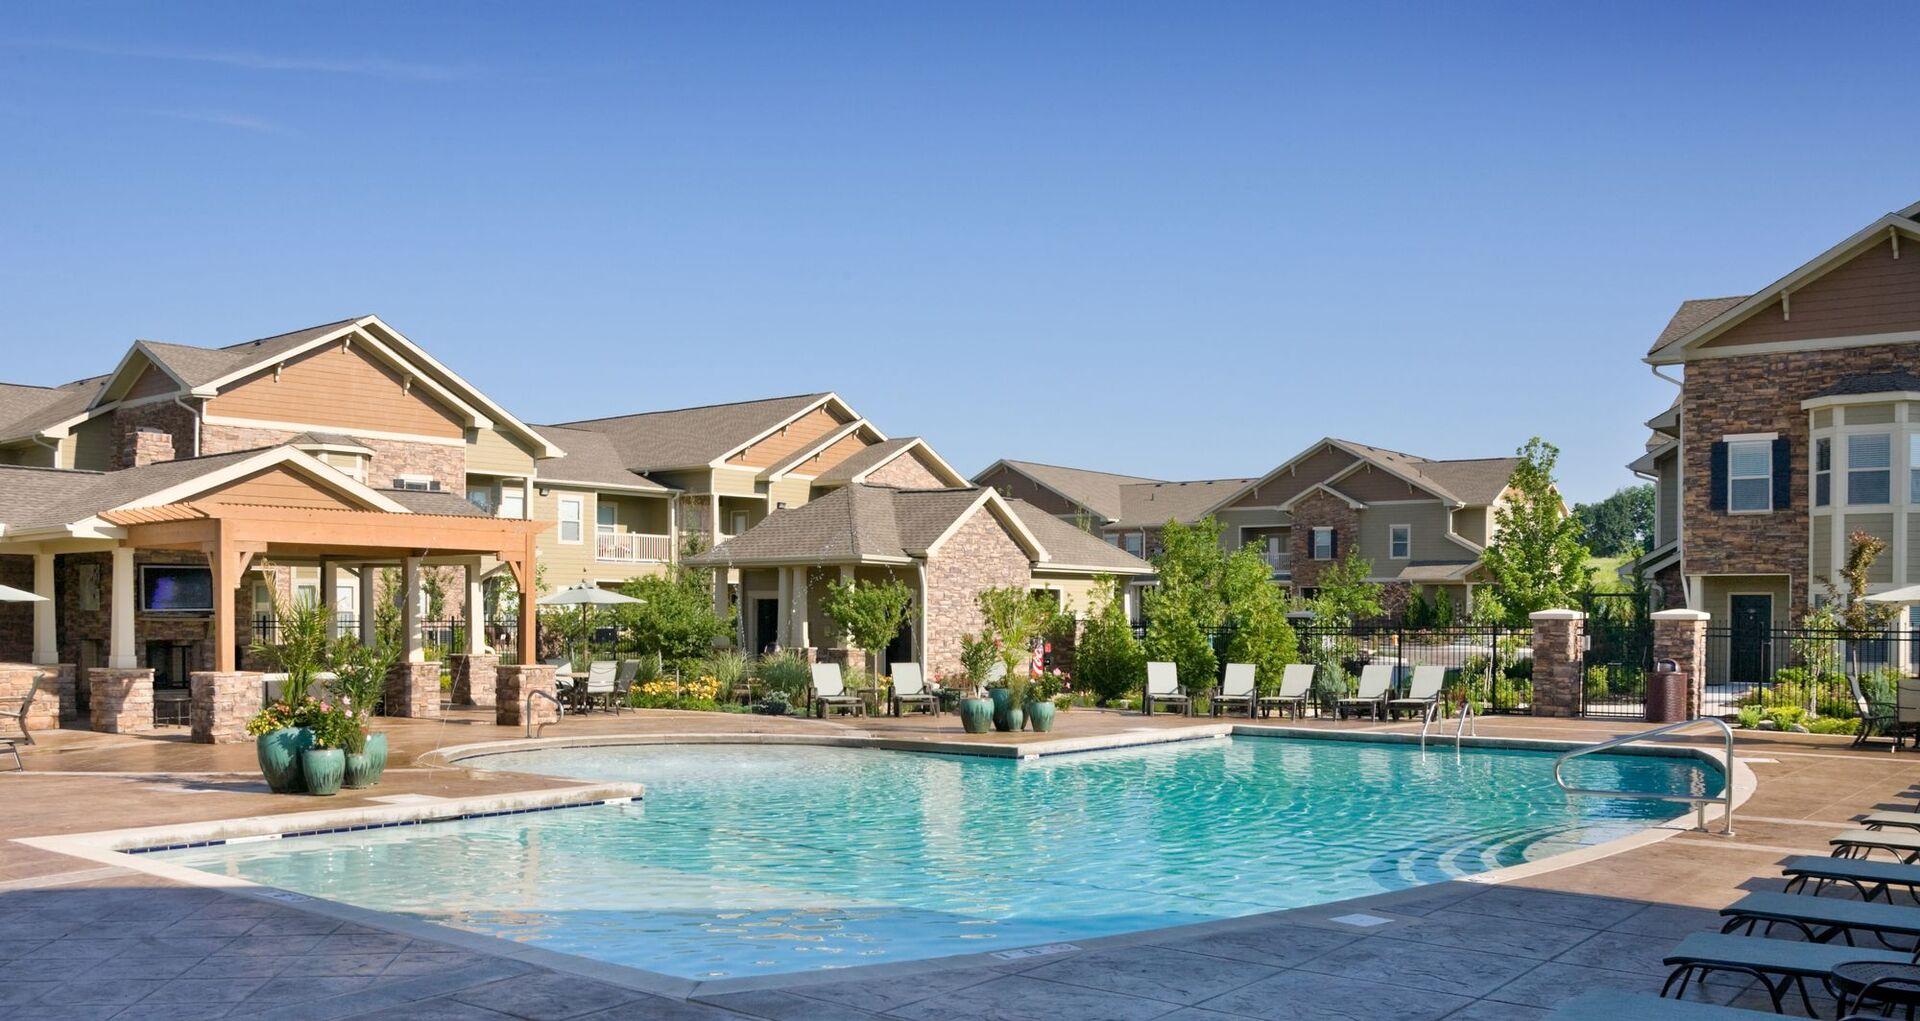 Home Rental Services Inc Overland Park Ks